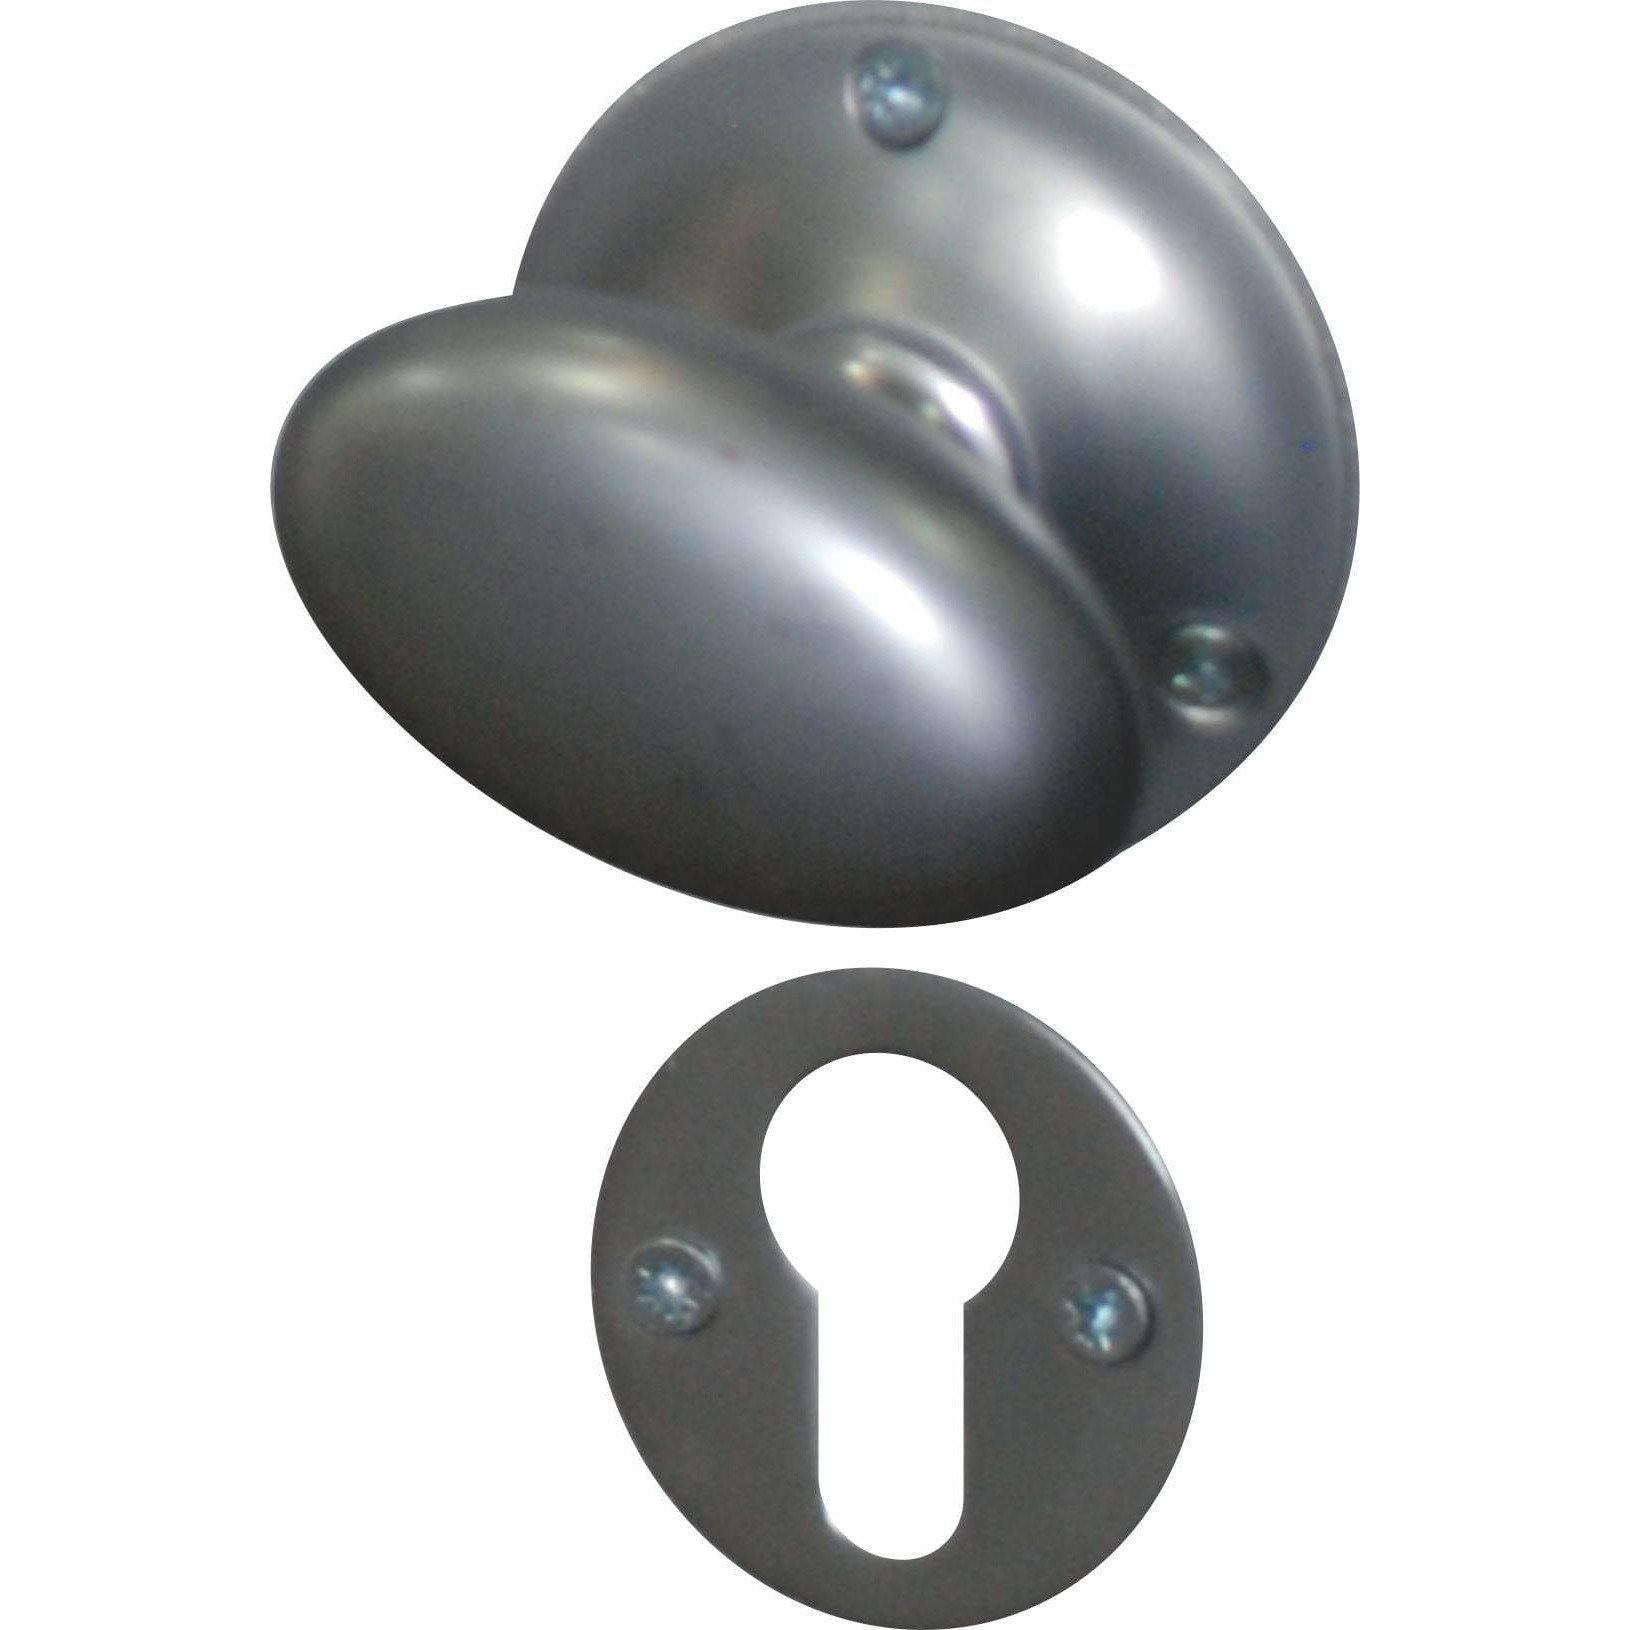 Oval solid brass knob